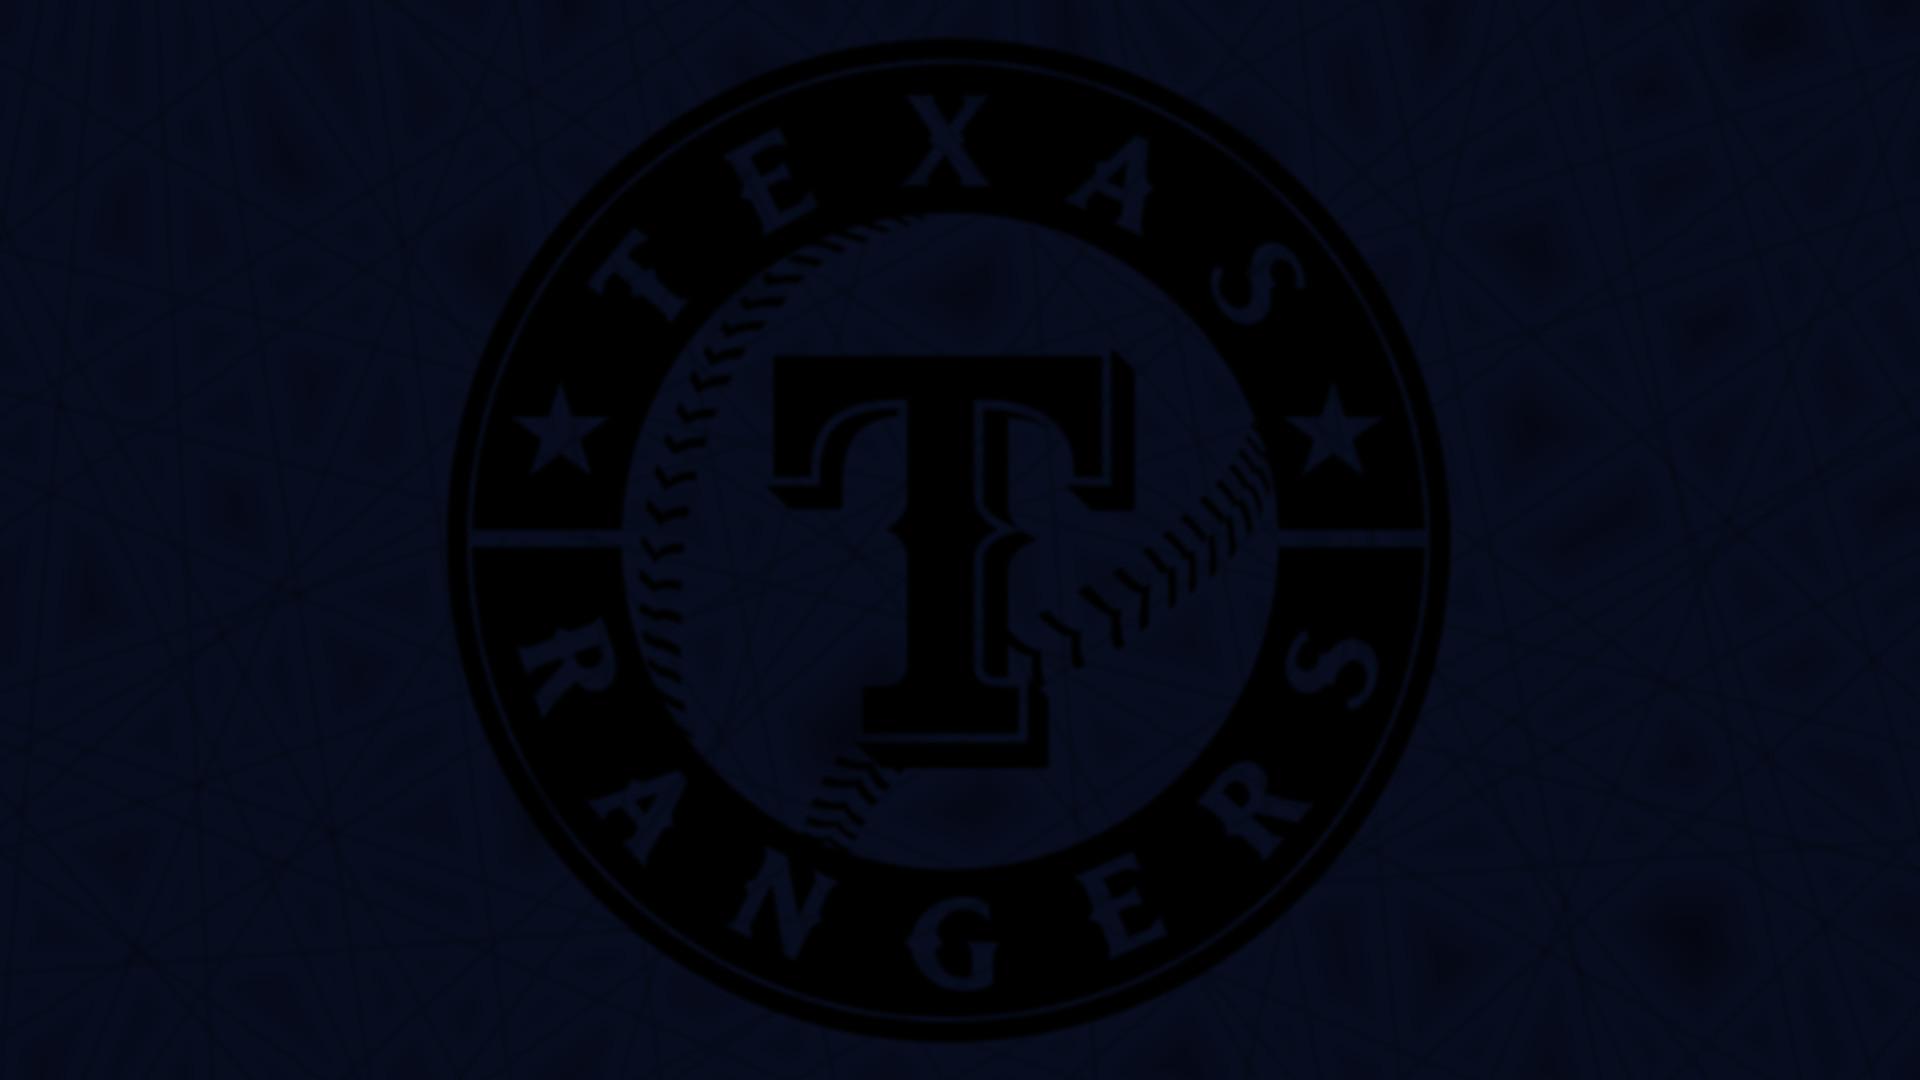 Texas Ranger Wallpaper images